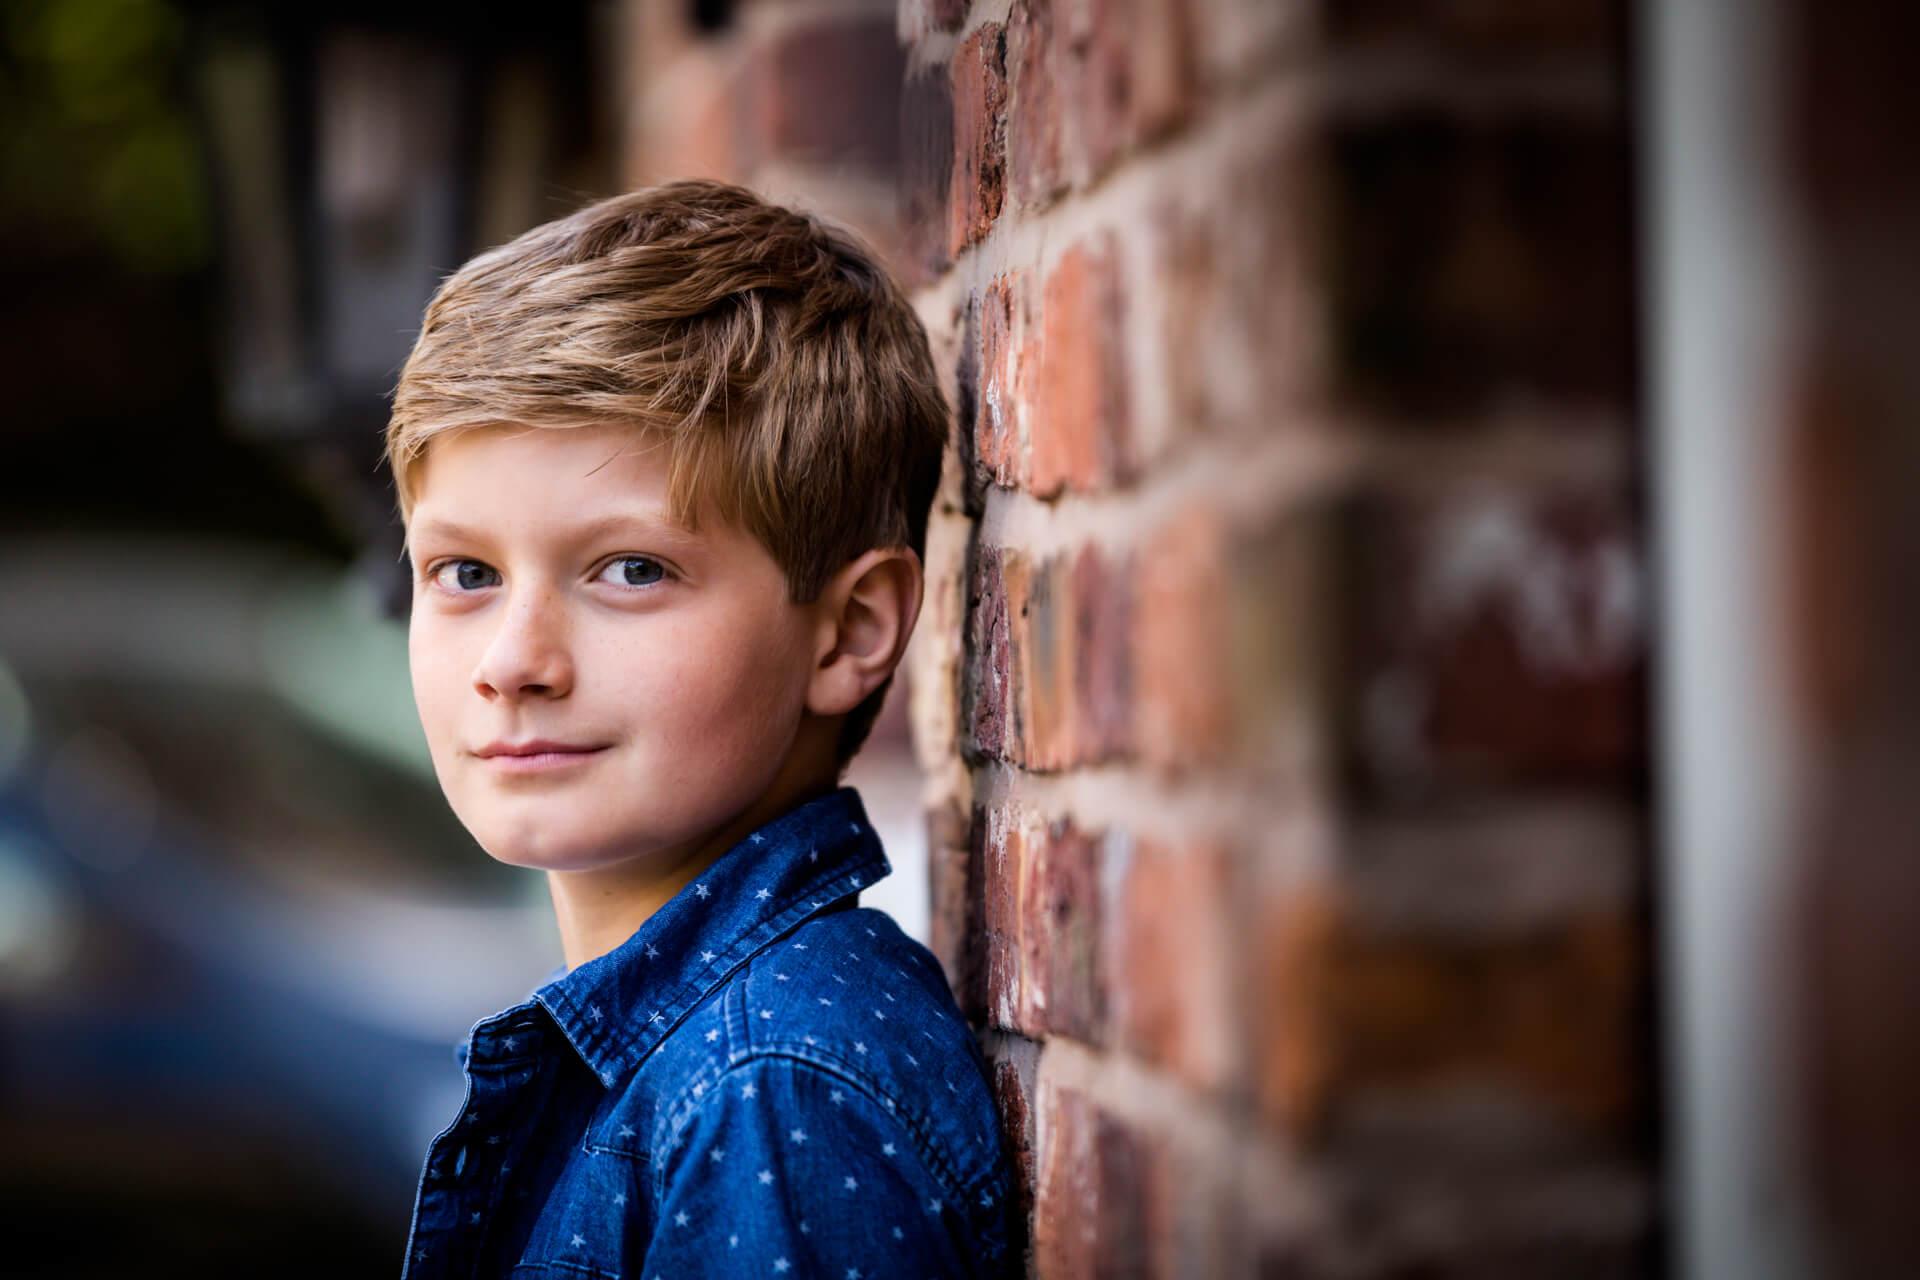 portrait of a teenage boy leaning against a wall